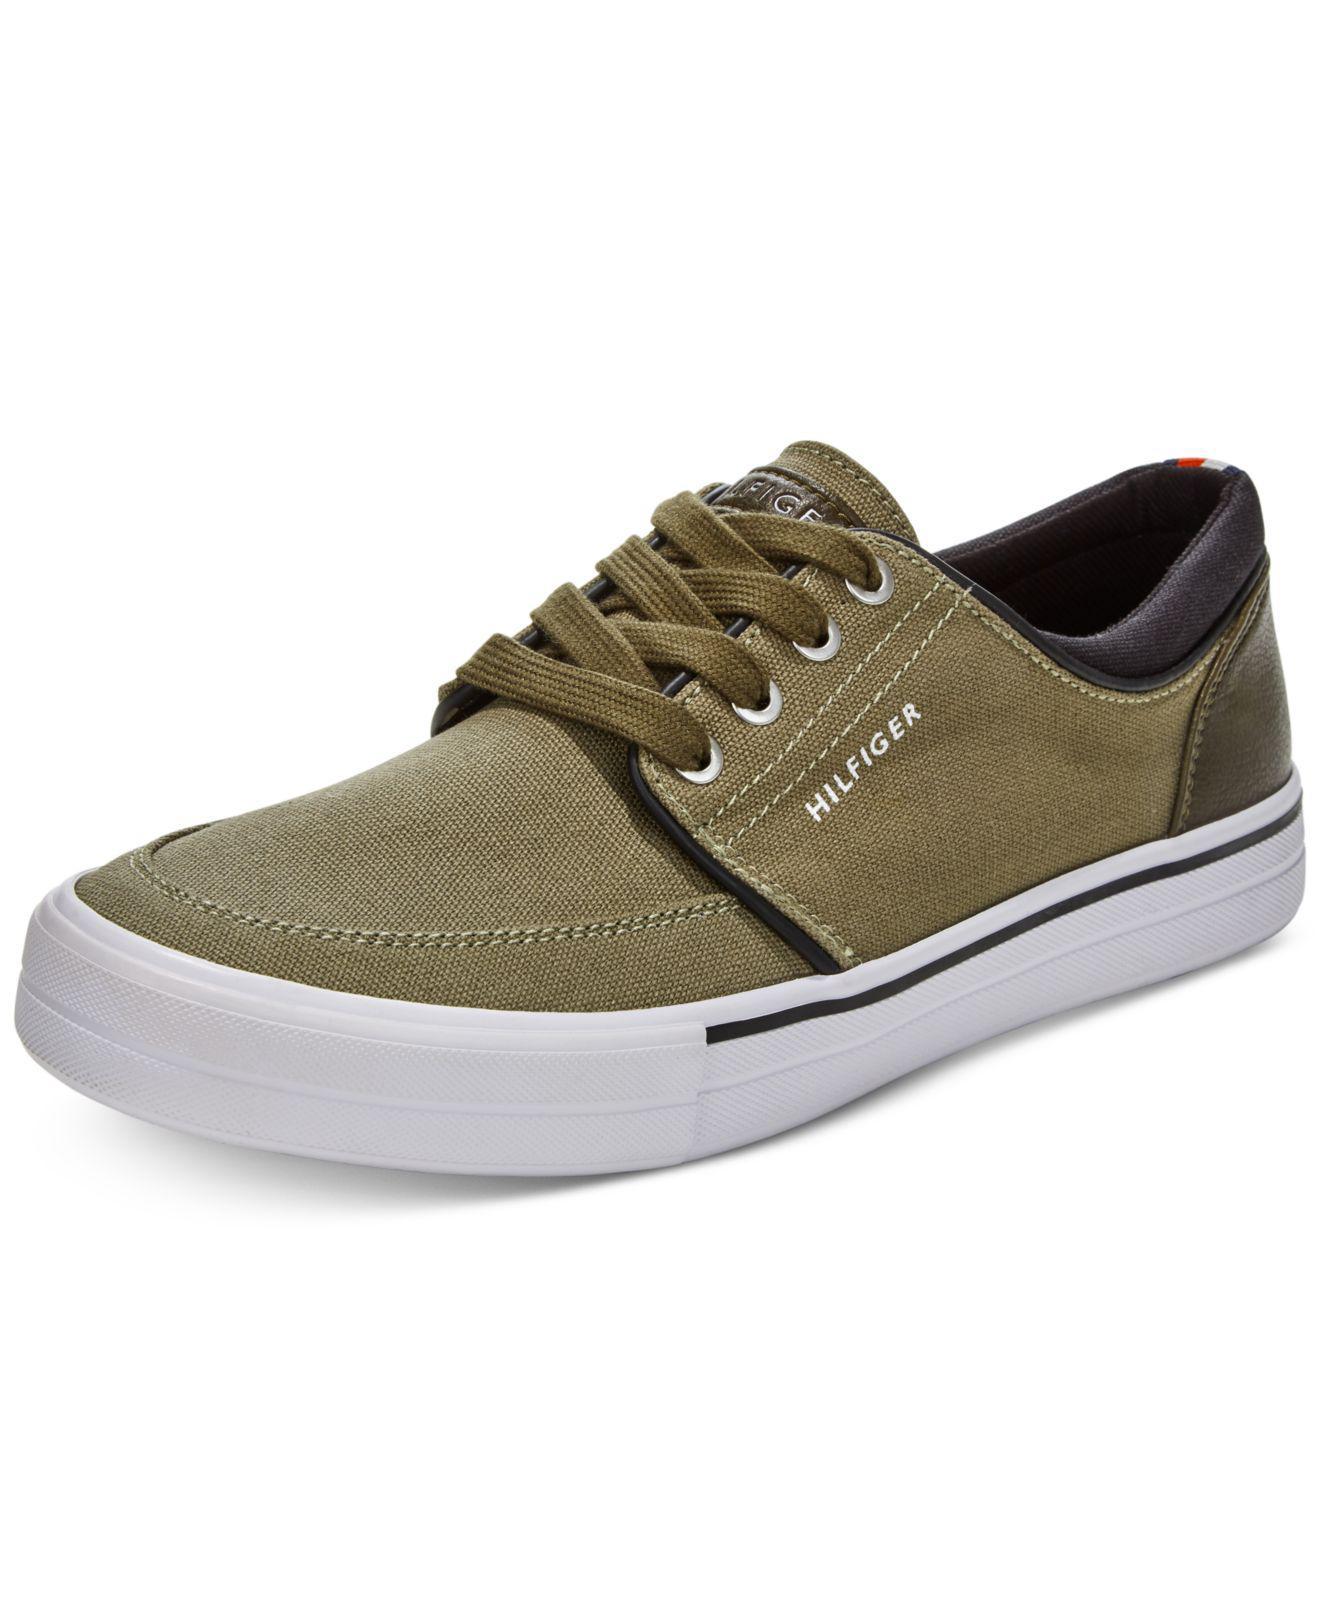 Tommy Hilfiger Redd 5 Twill Sneaker InmdM